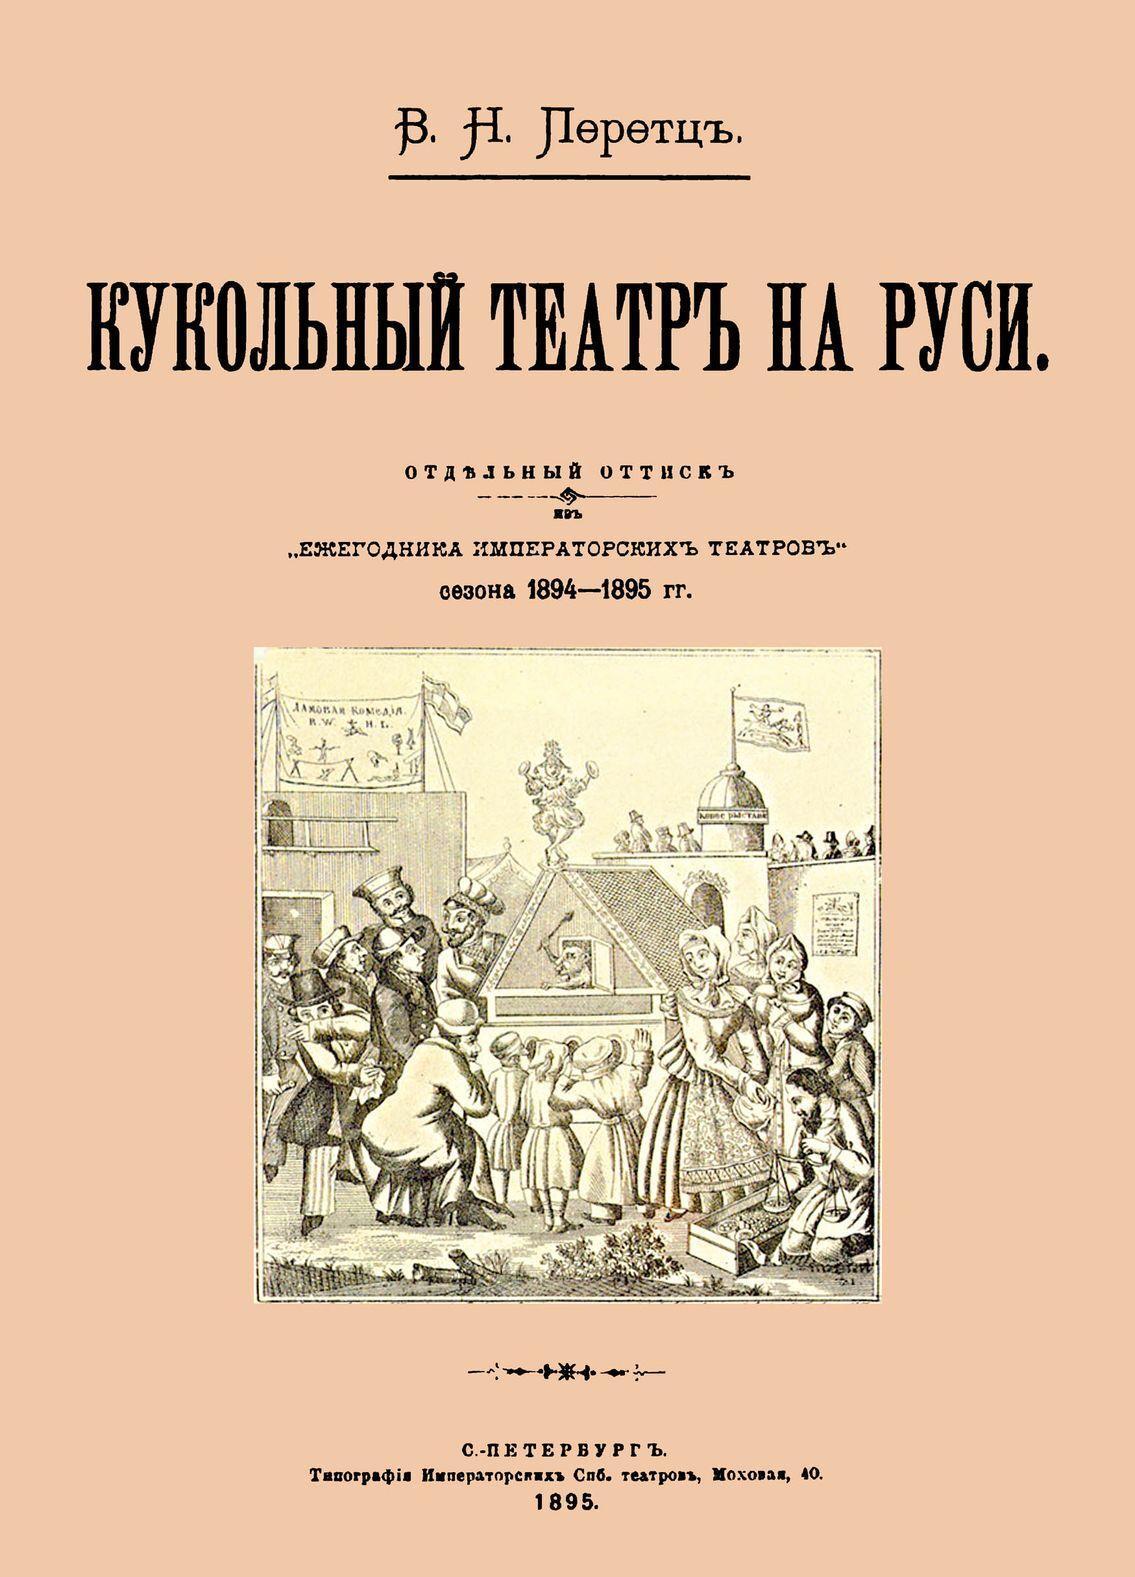 Kukolnyj teatr na Rusi